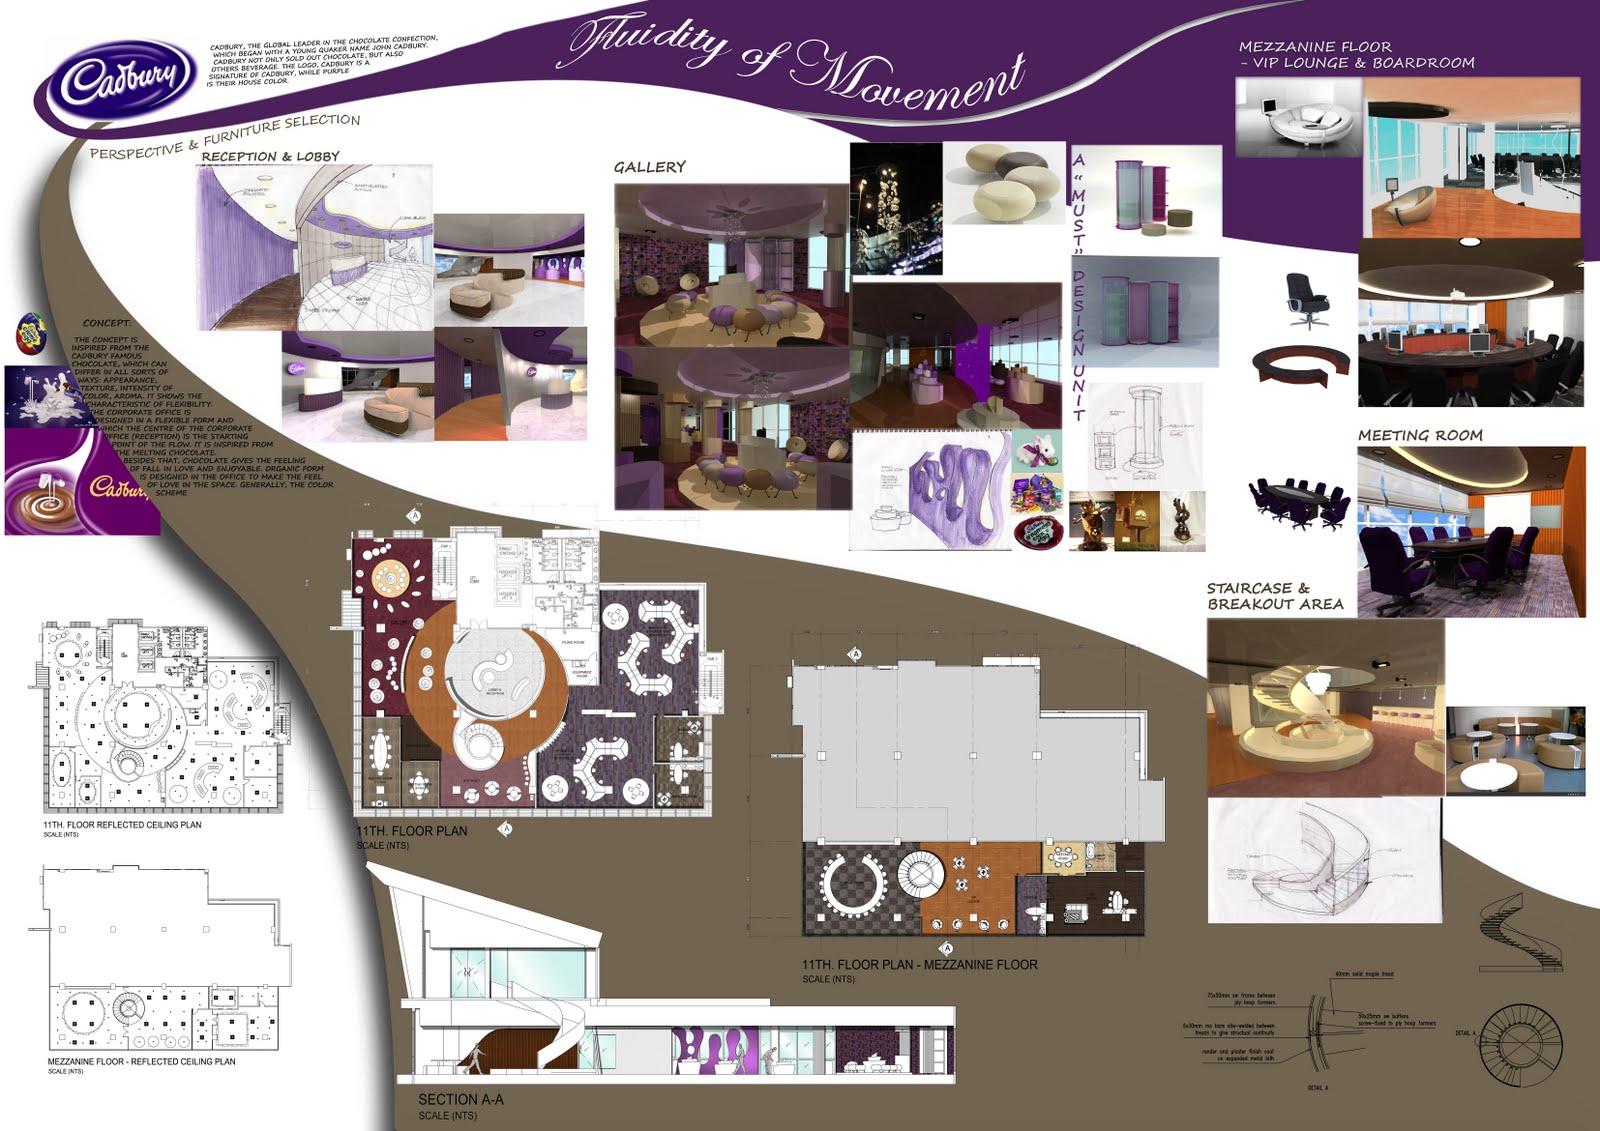 Corporate office cadbury for Interior design office ppt